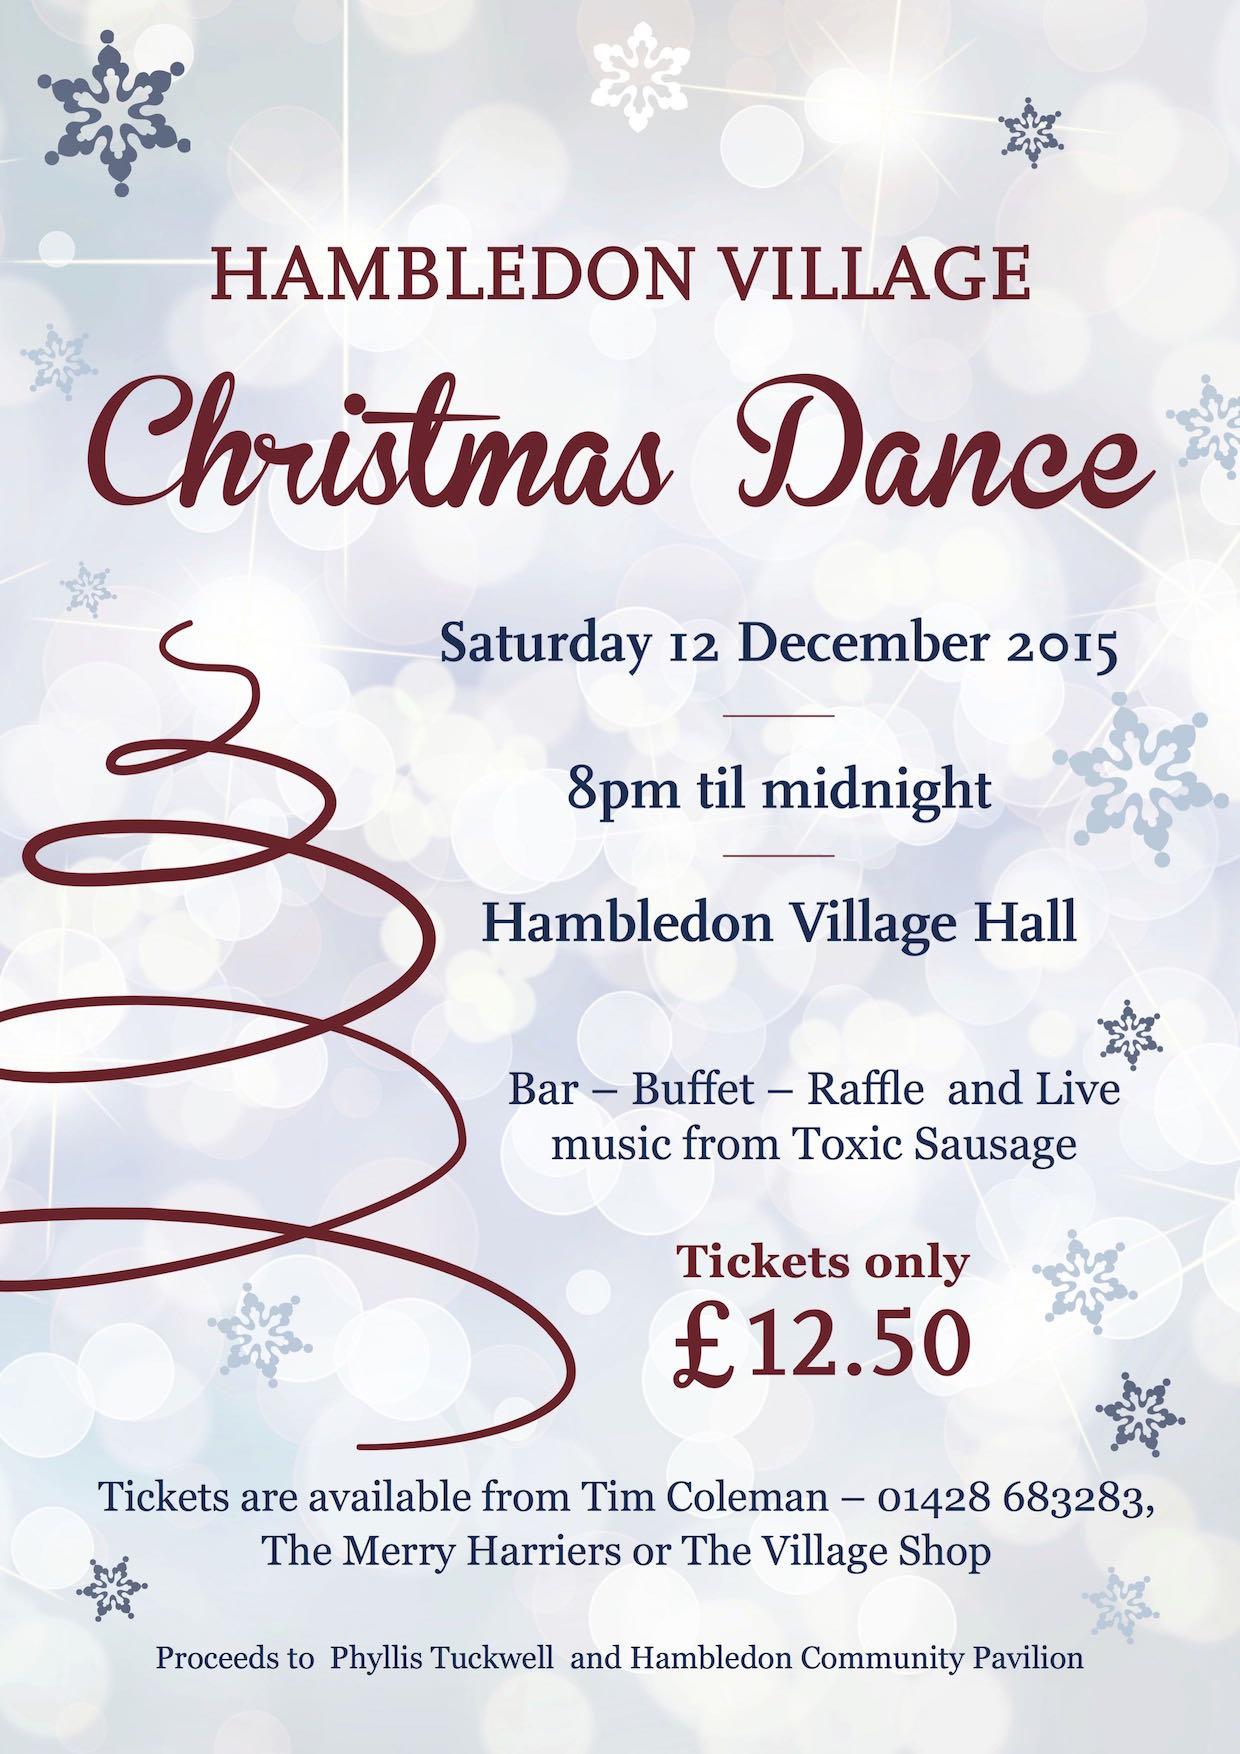 2015 Hambledon Christmas Dance POSTER half size